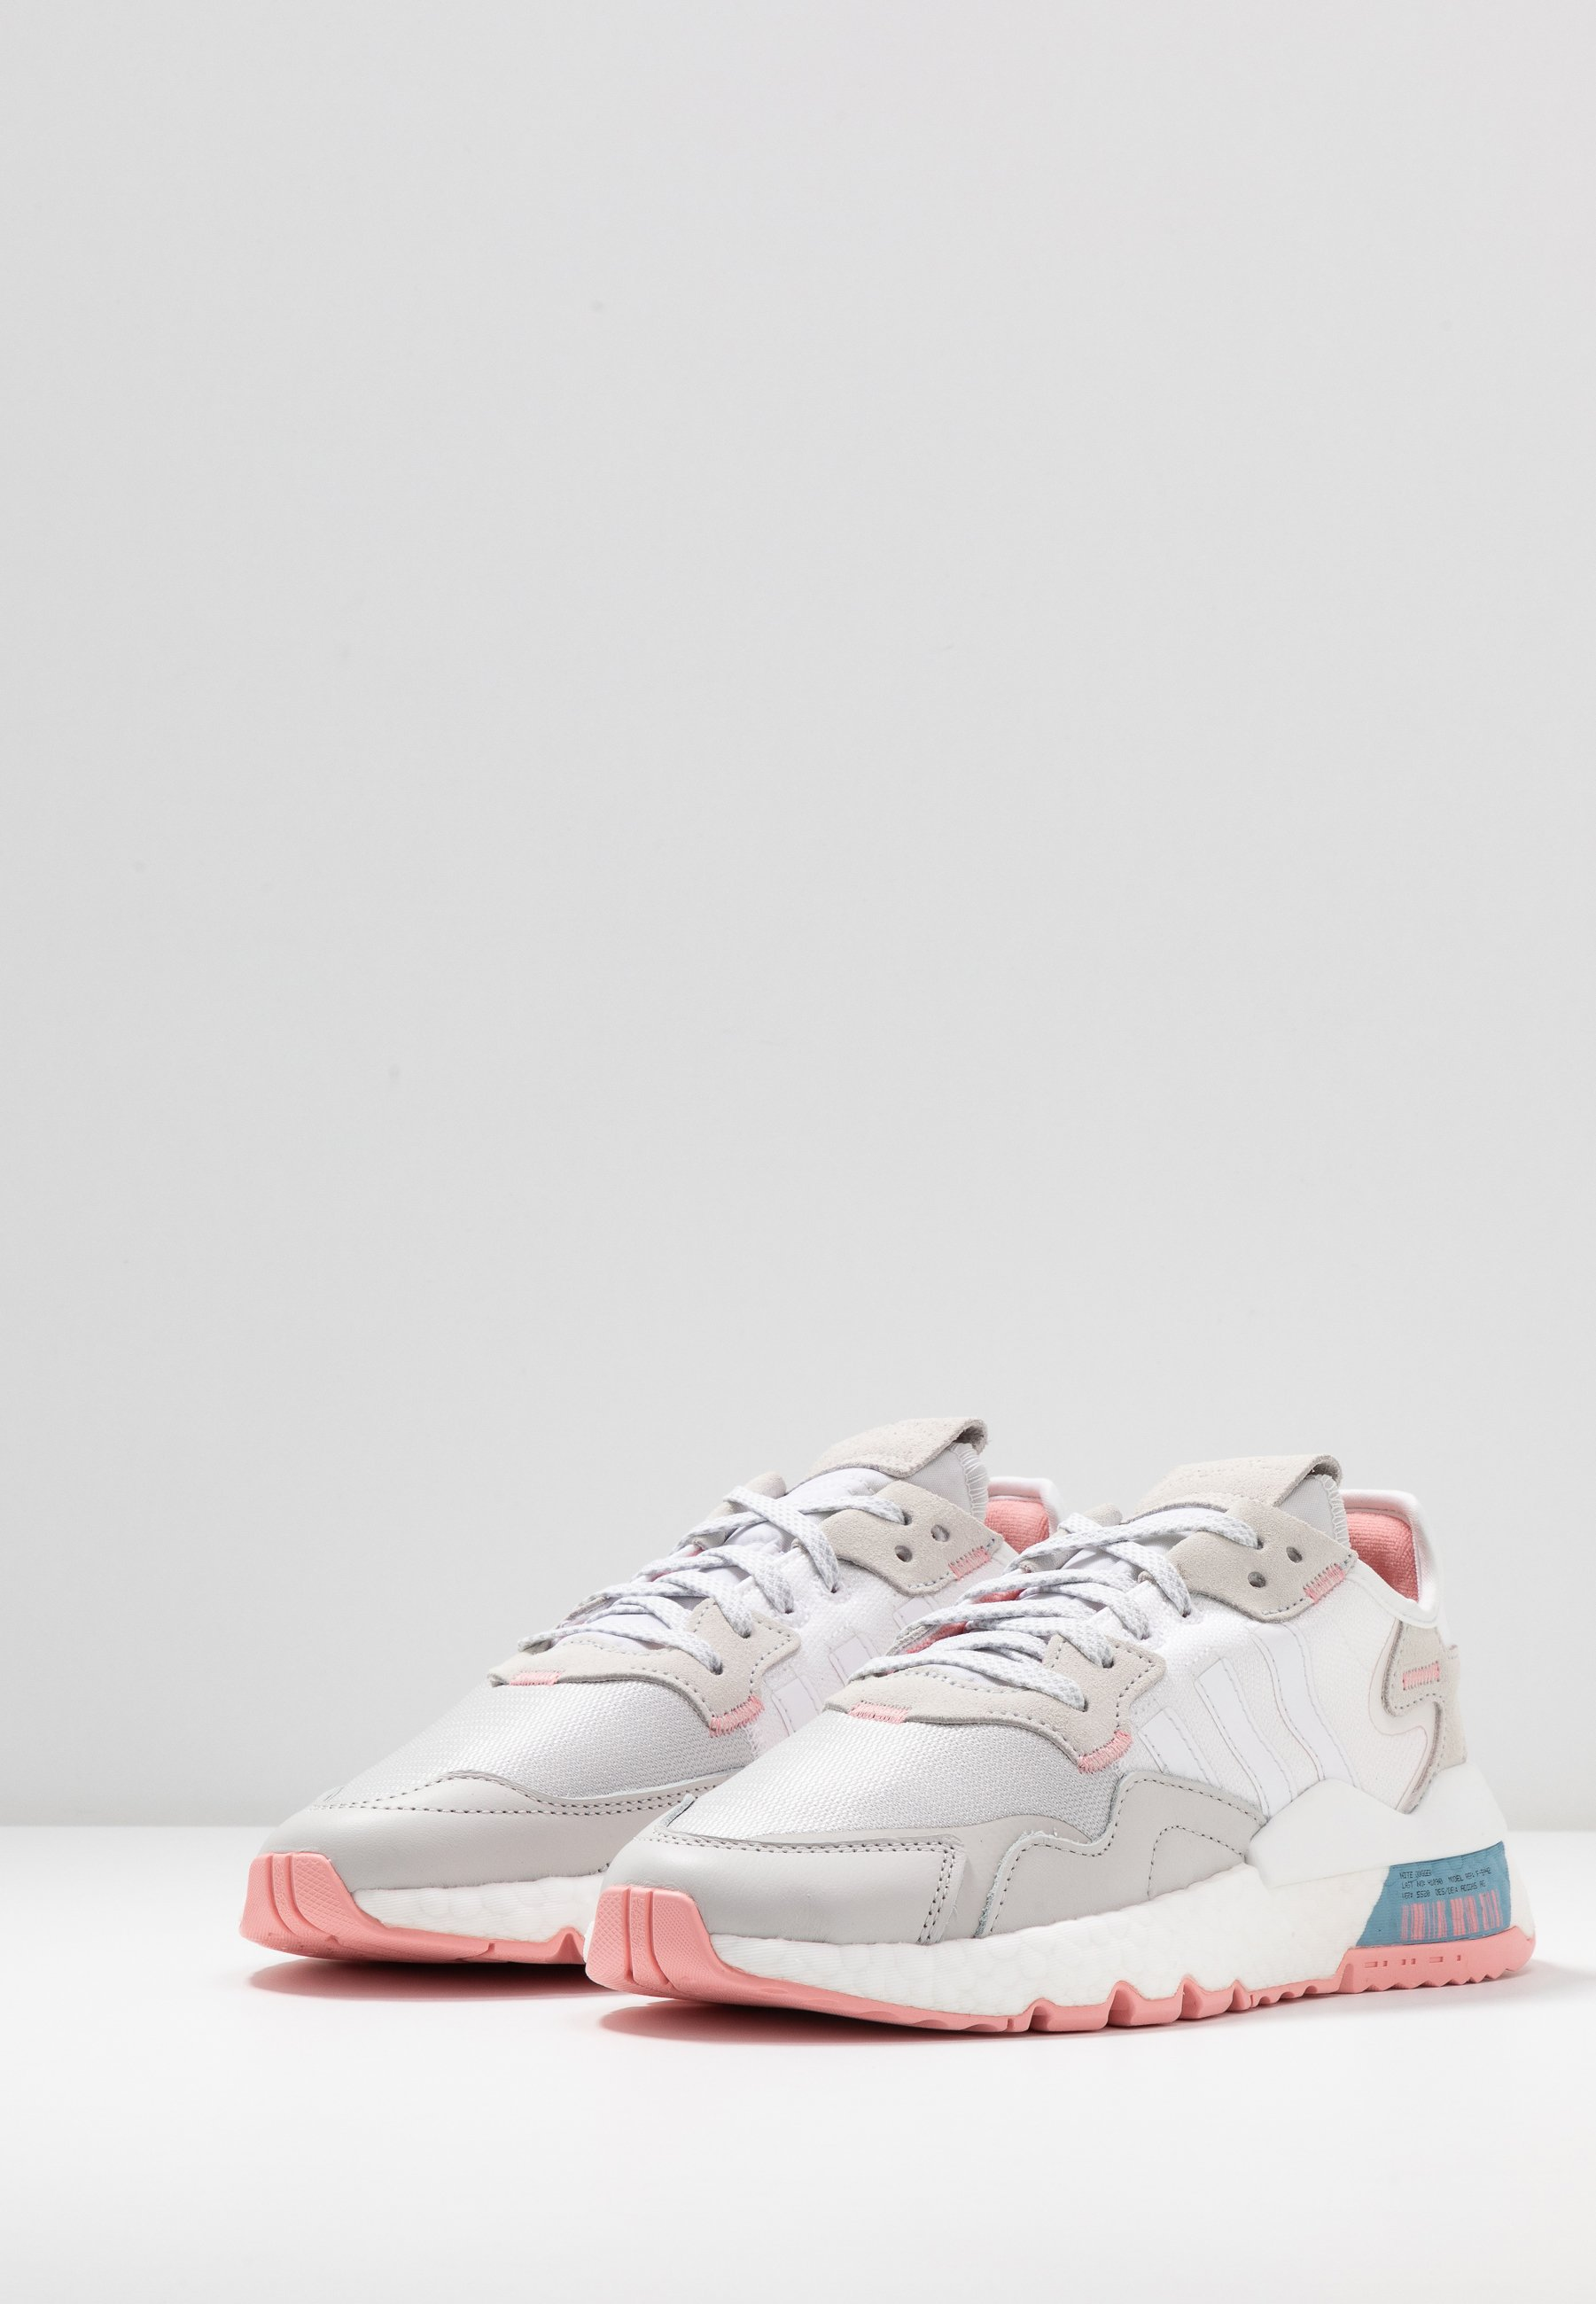 Adidas Originals Nite Jogger - Sneakers Footwear White/glow Pink/grey One